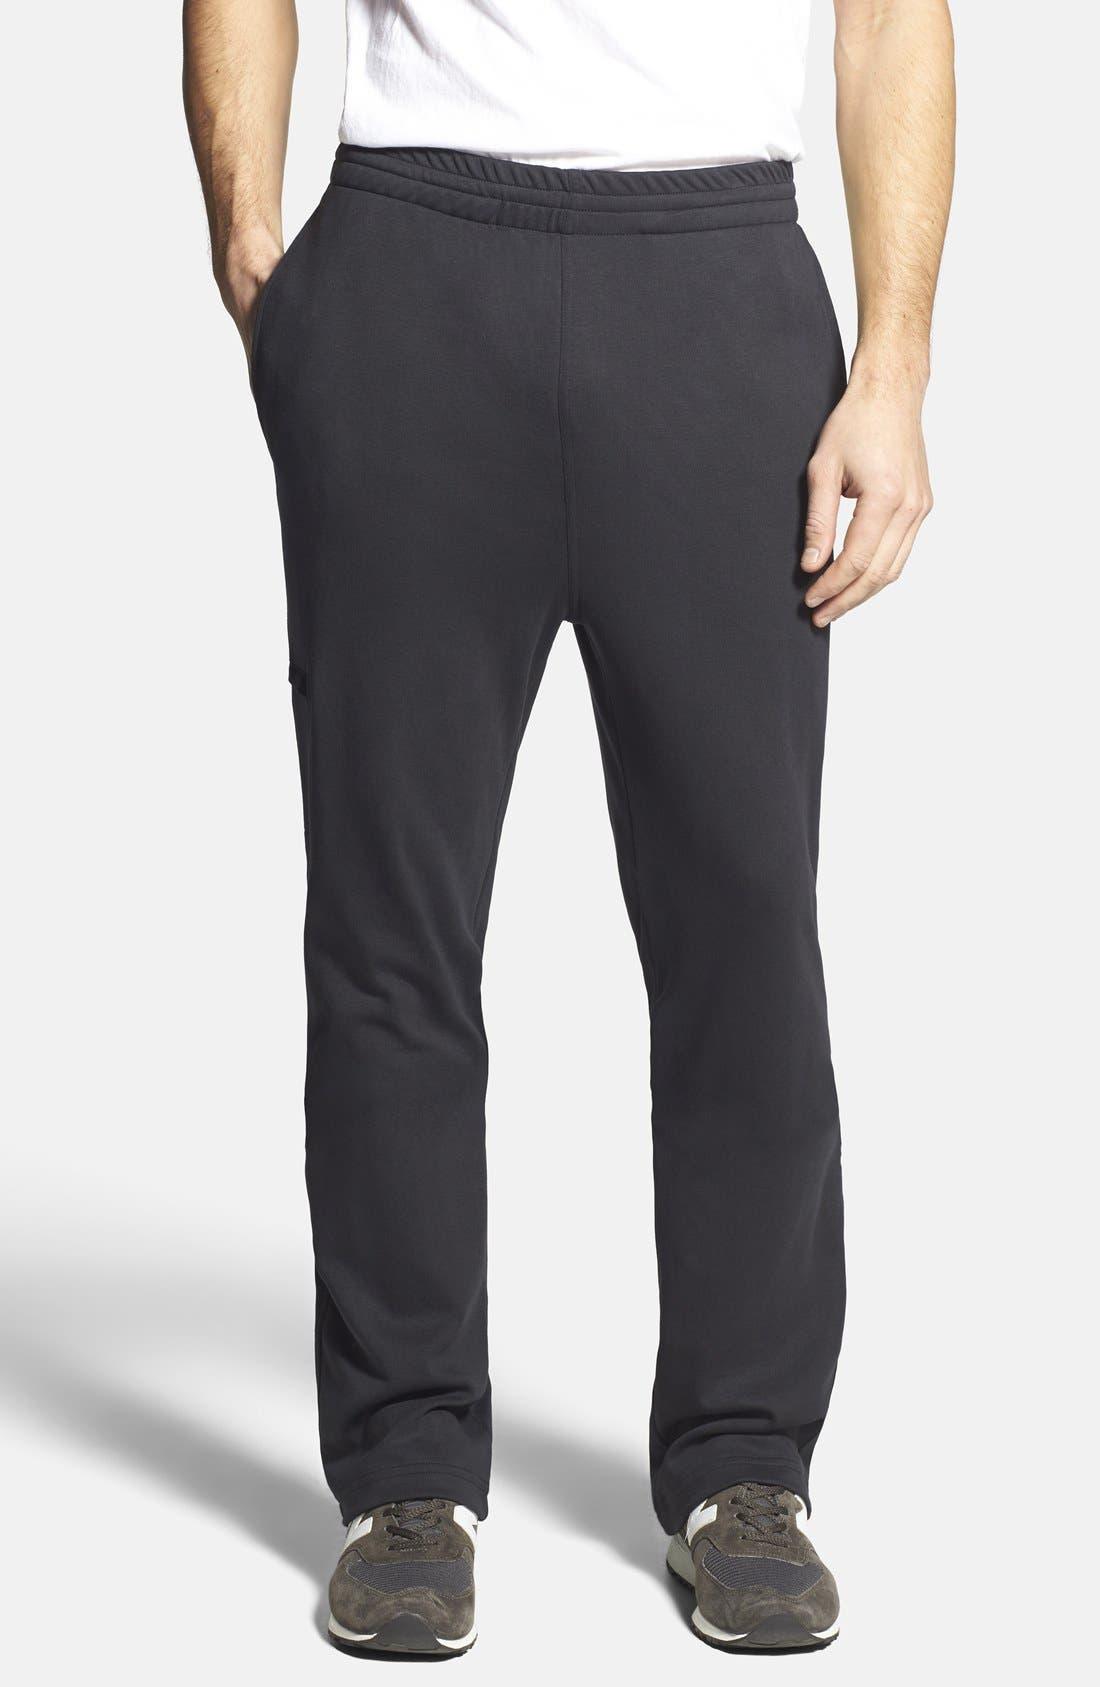 Bobby Jones Leaderboard Straight Leg Sweatpants